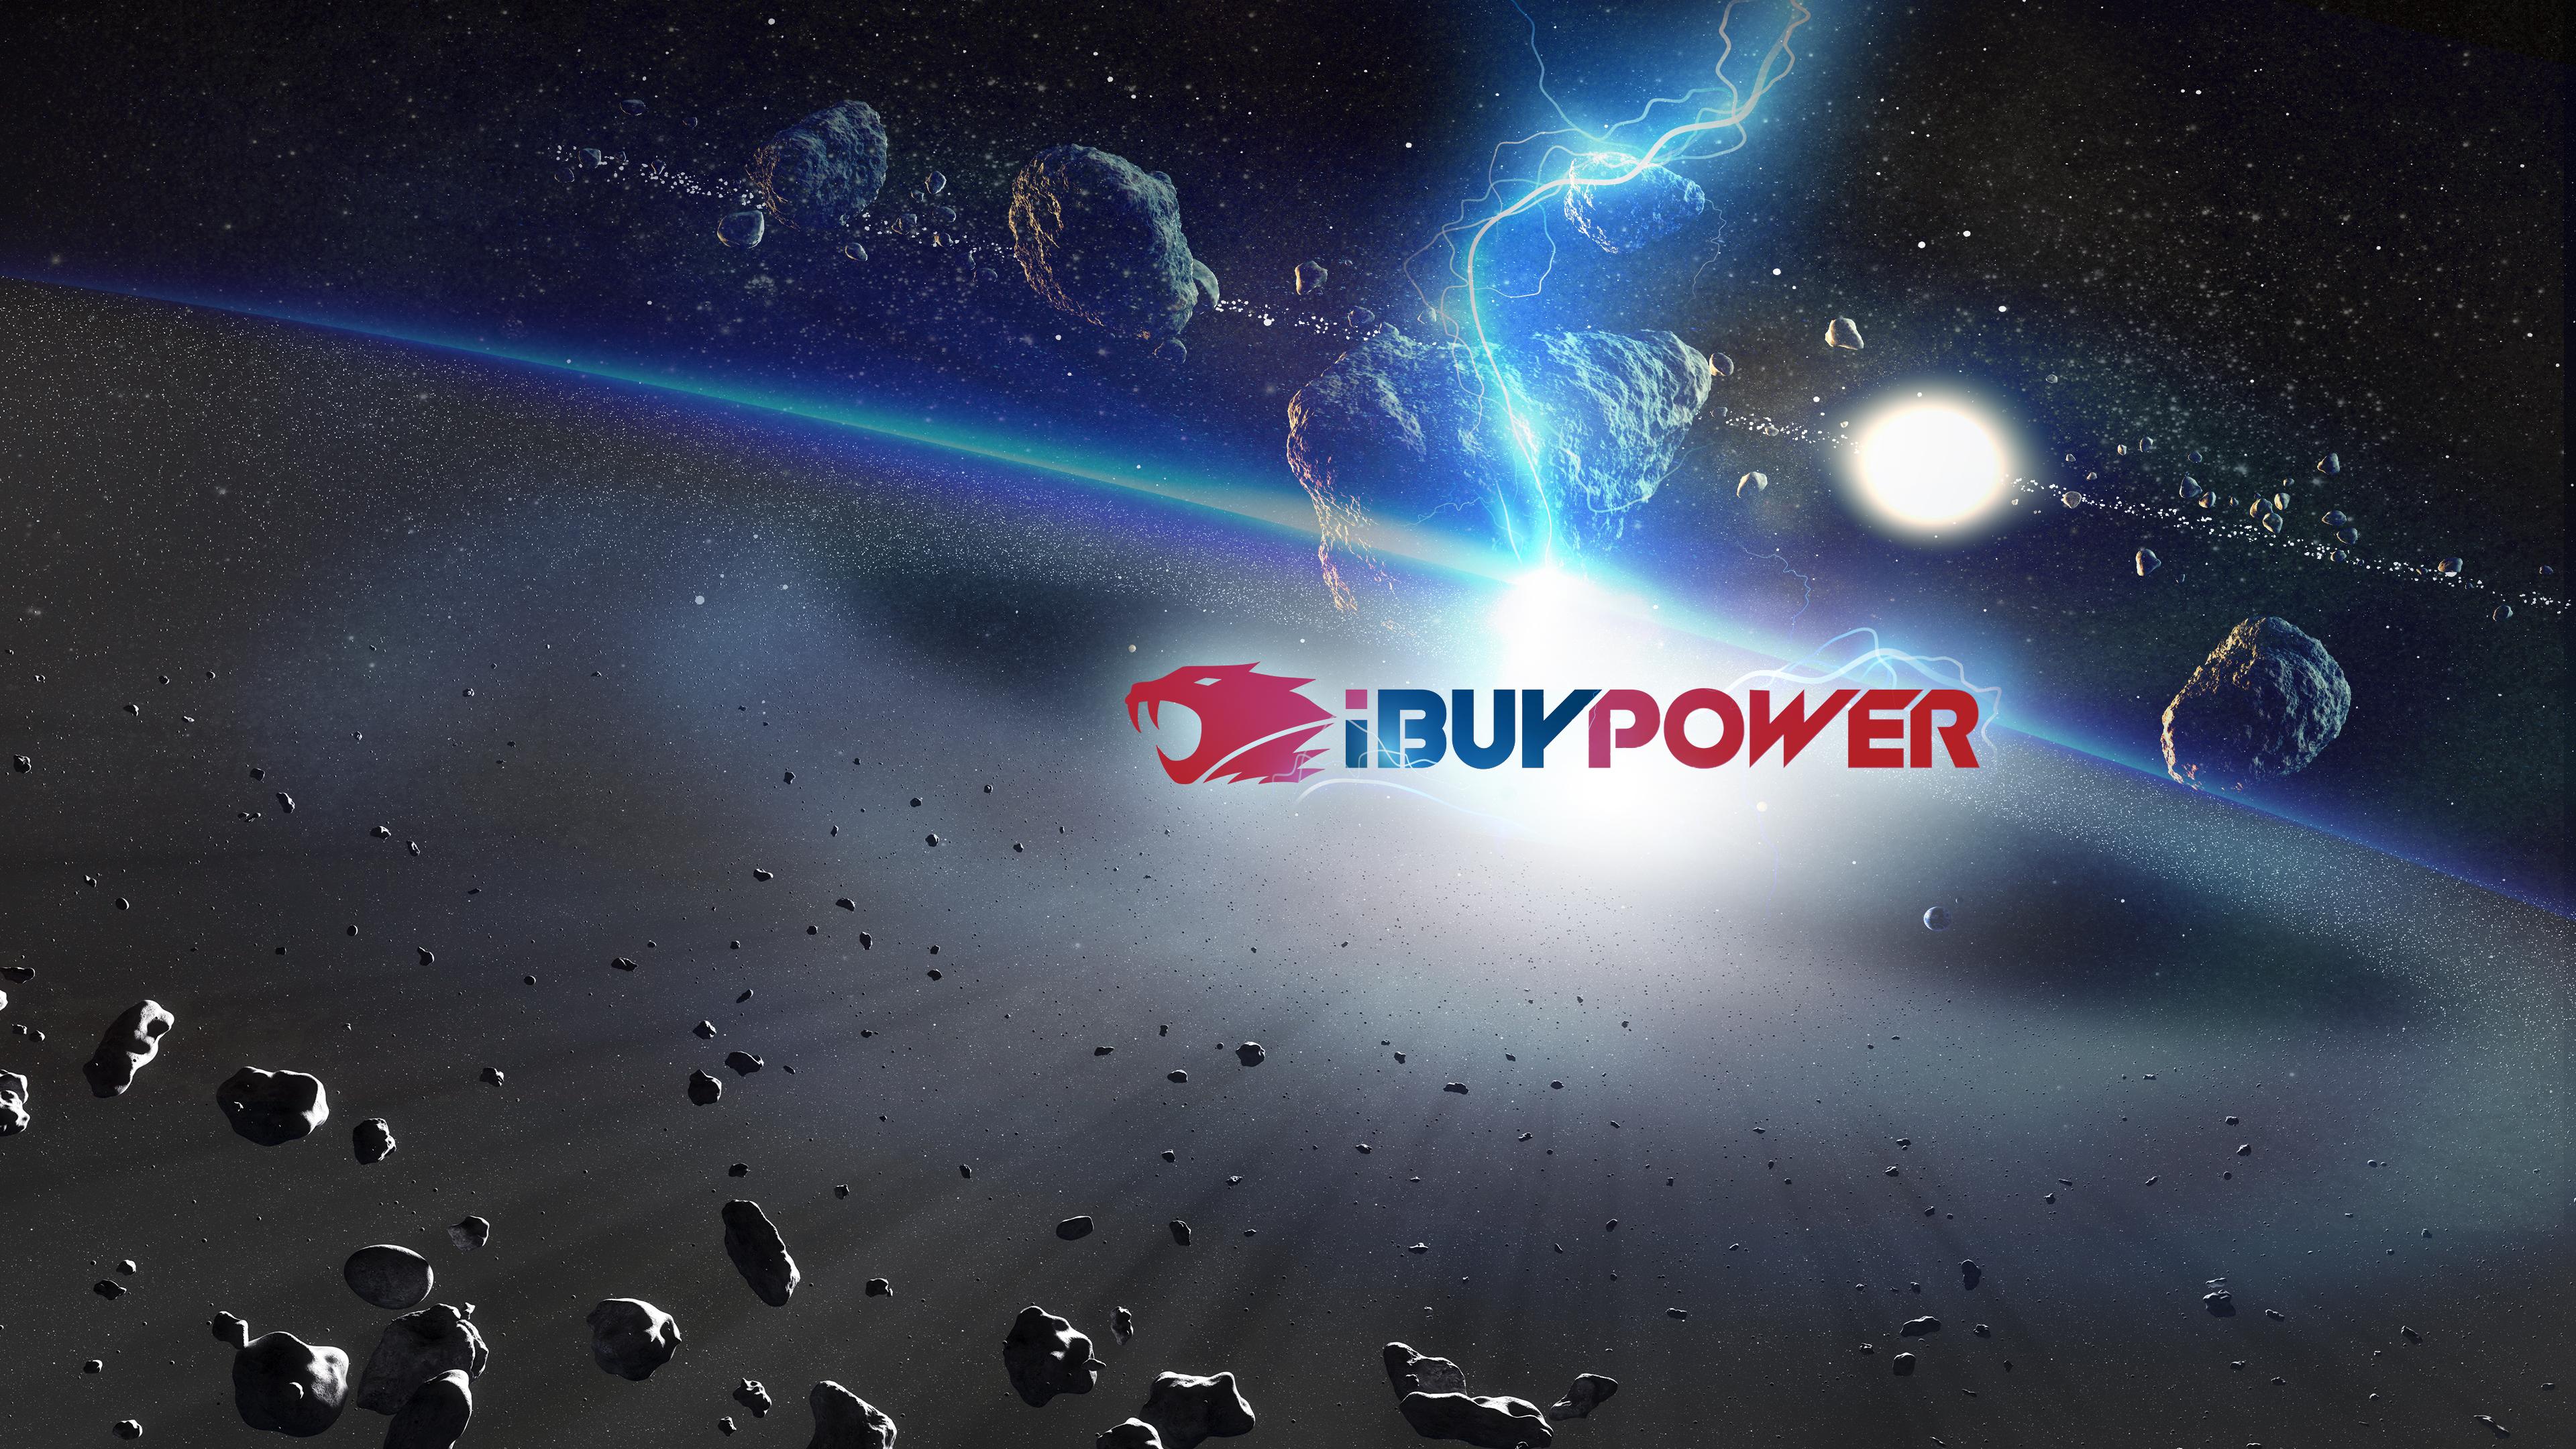 Wallpaper Ibuypower